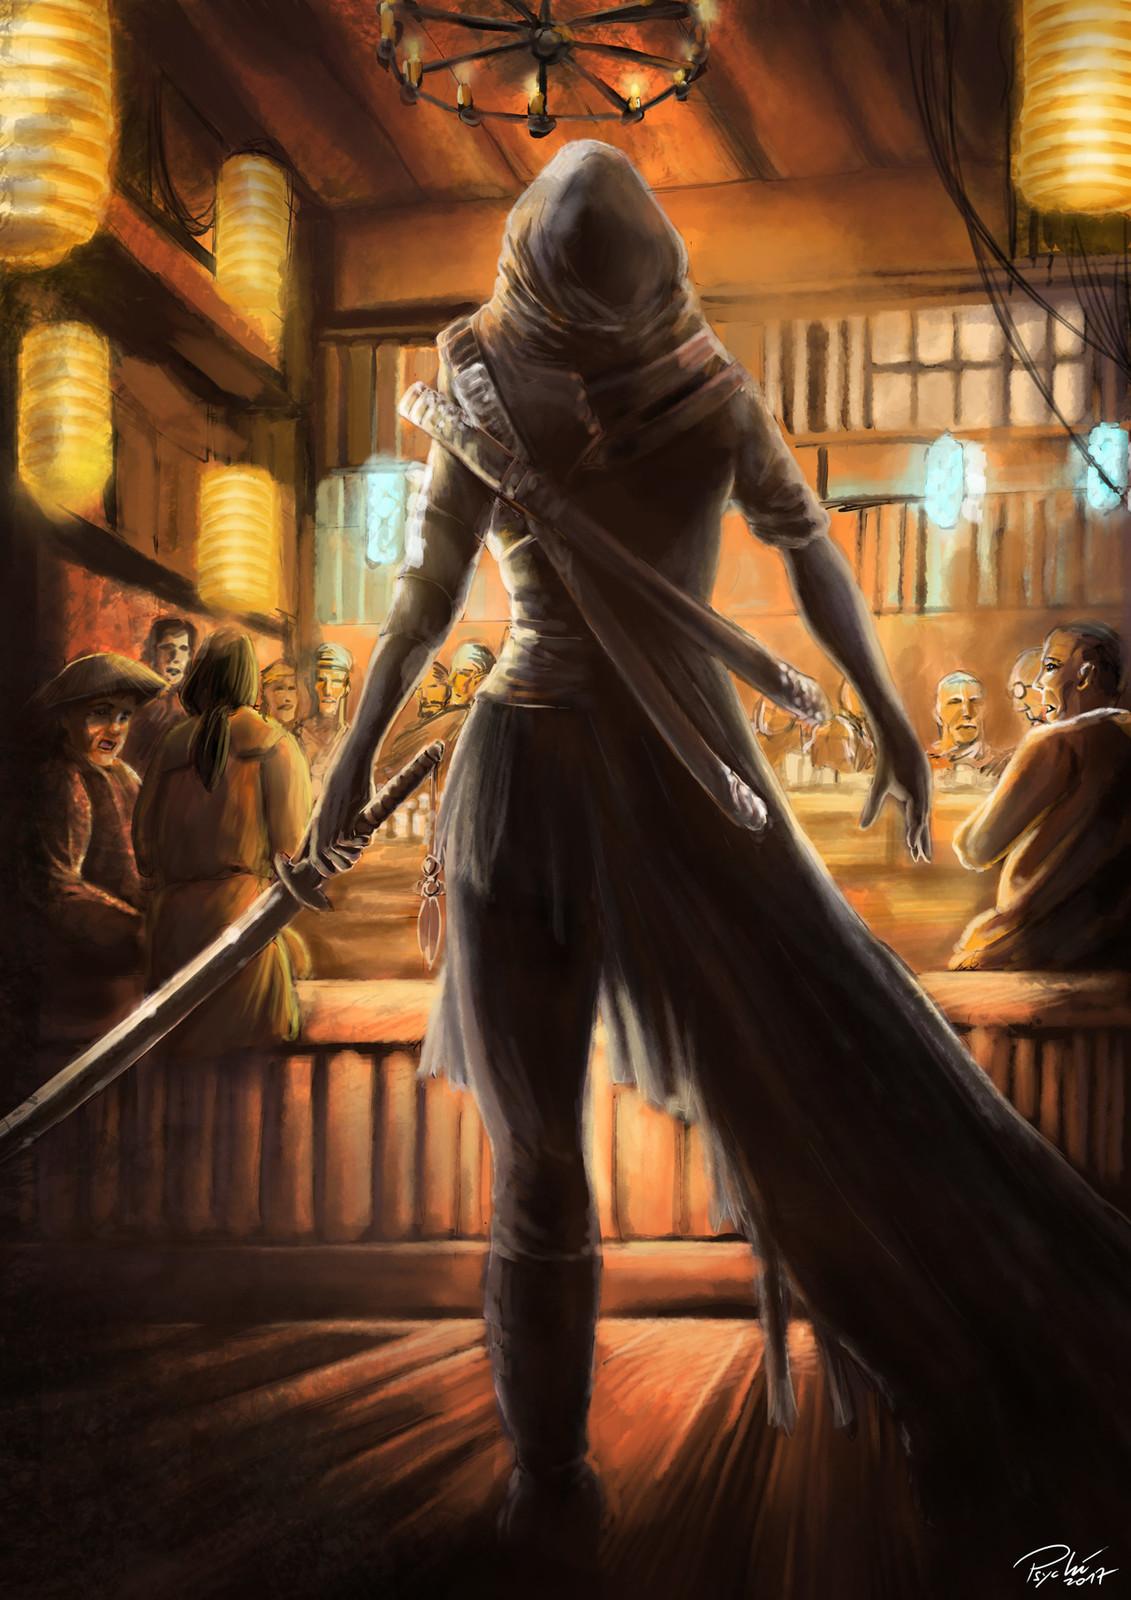 Blade & Tavern